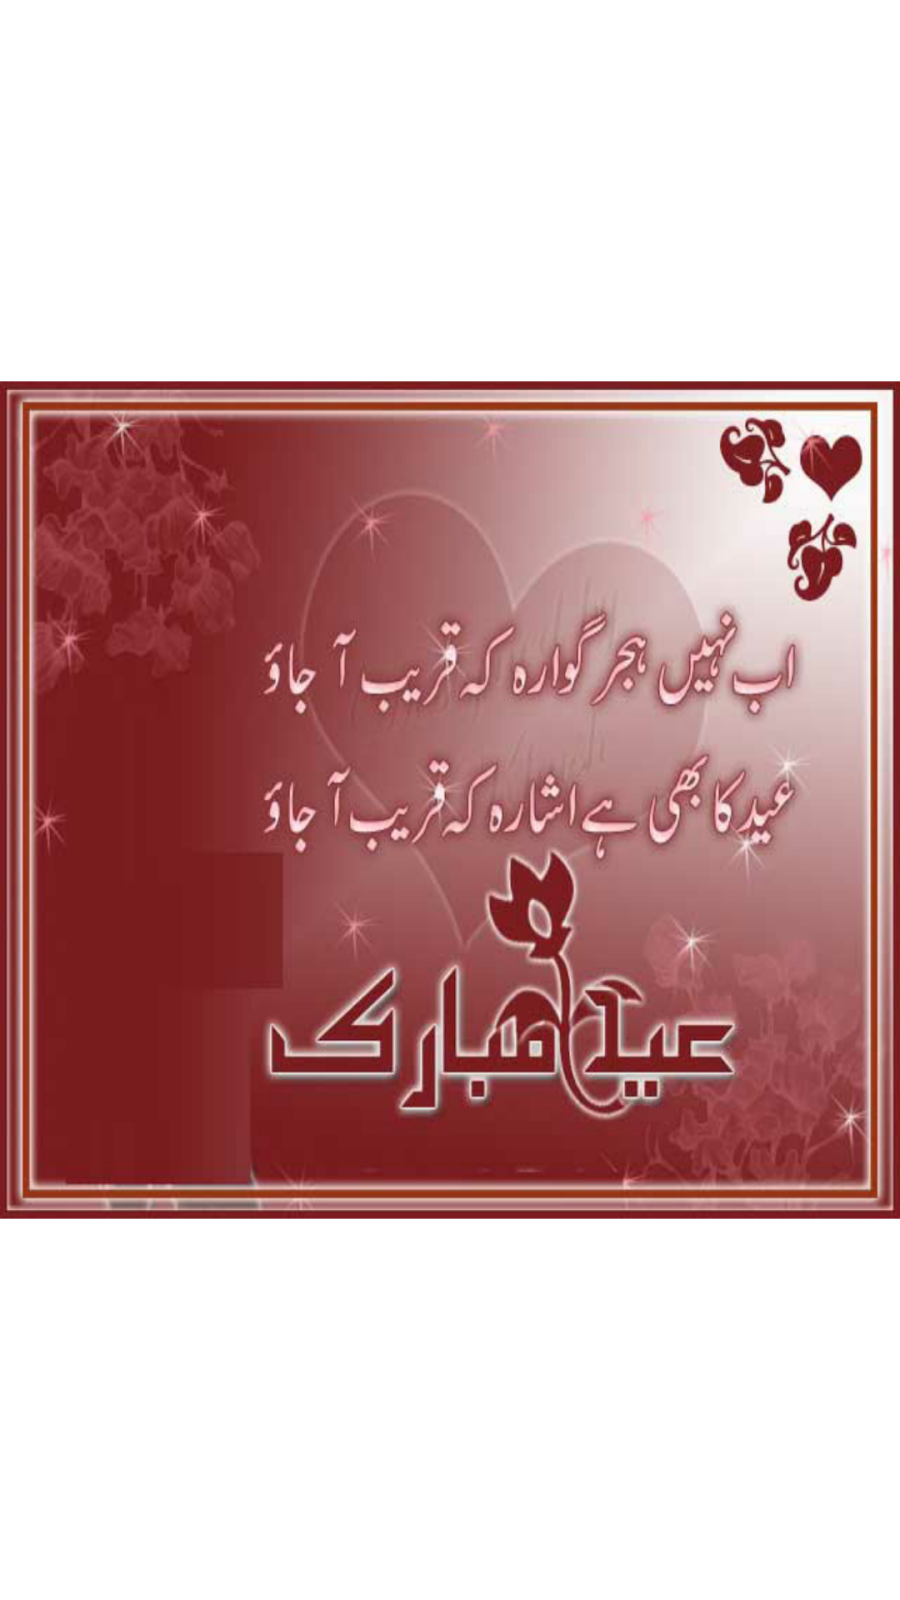 Ab Nahi Hijar Gawara K Kareeb Aa Jao Eid Mubarak Urdu Romantic